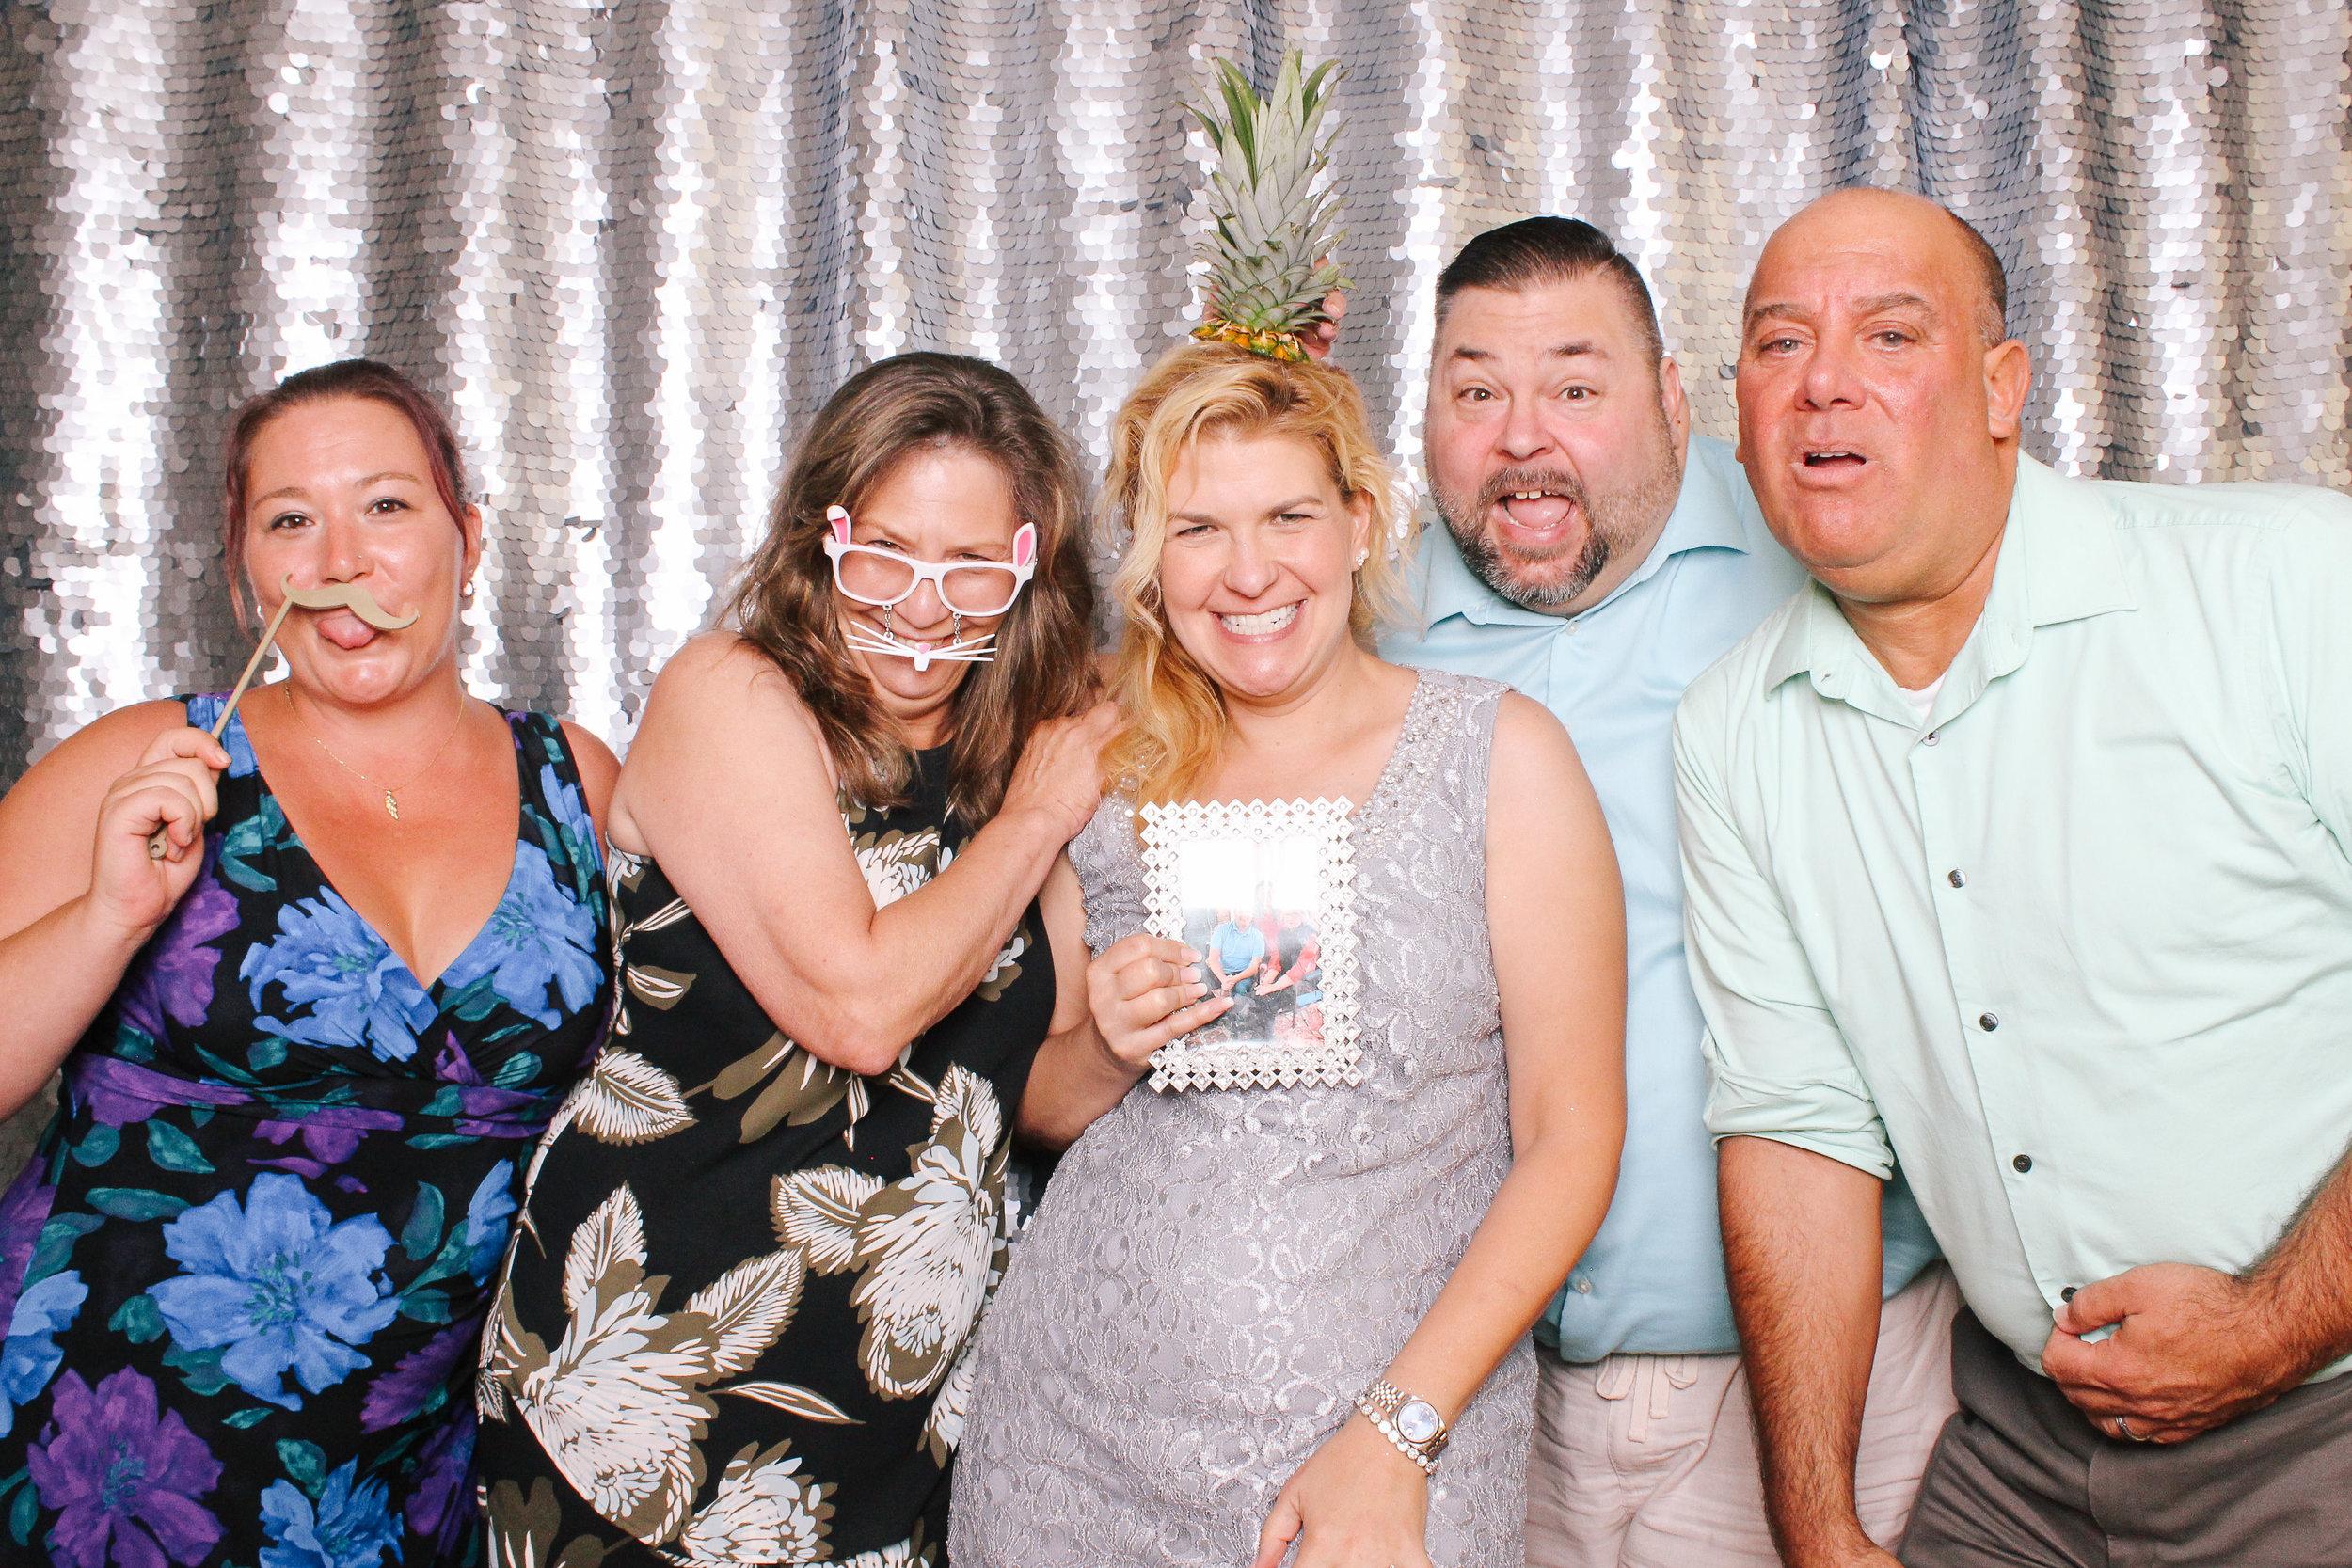 0086 Cleveland Wedding Photobooth too much awesomeness.jpg